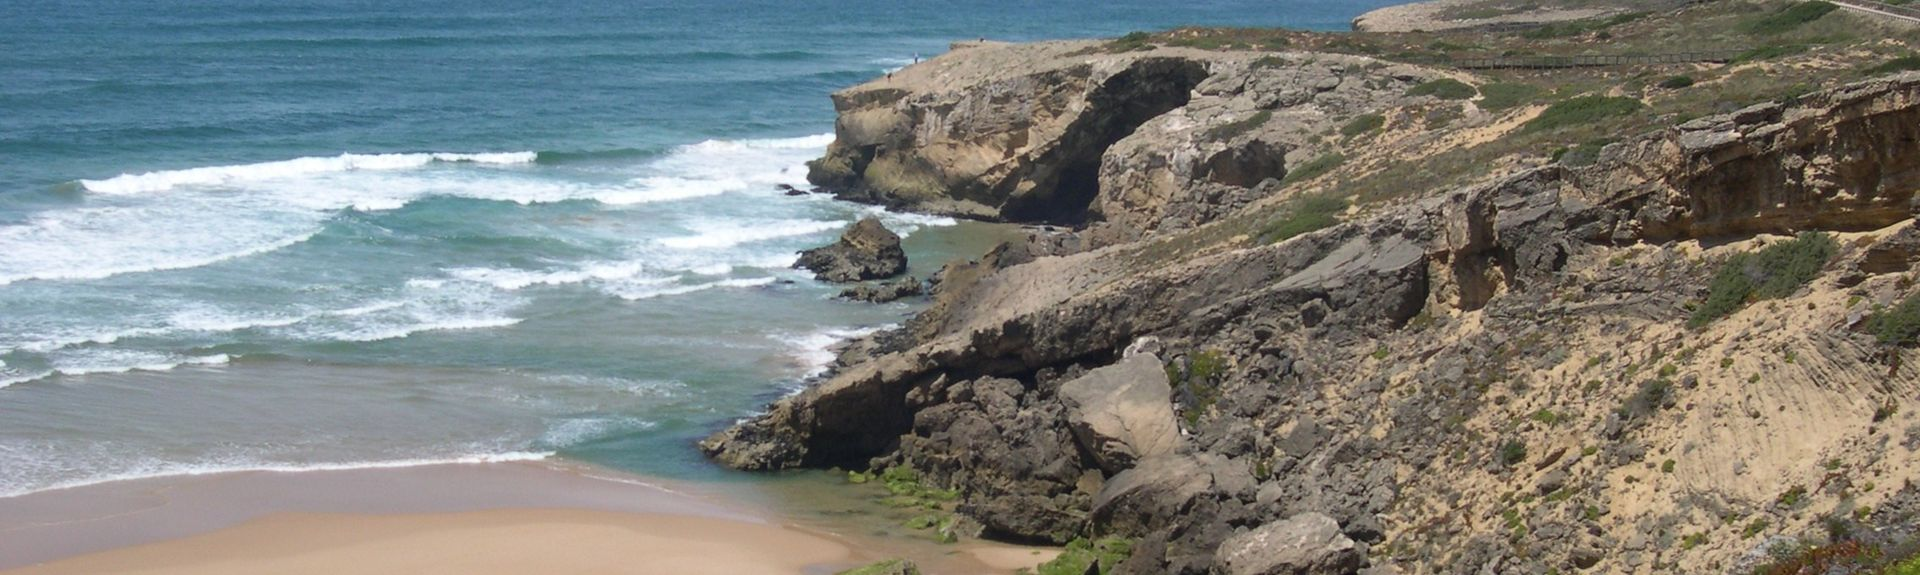 Praia do Monte Clérigo, Aljezur, Distrito de Faro, Portugal